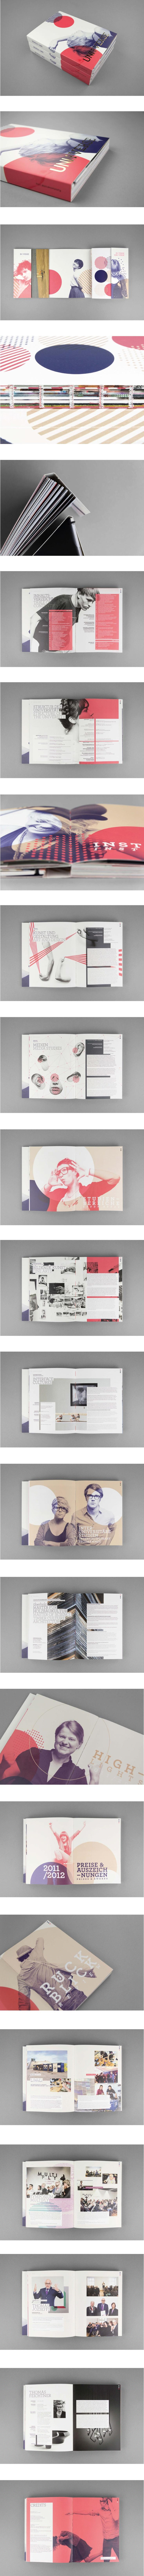 UNI:VERSE 2012 Image-Publication for the Art University of Linz  Design: MOOI design Photography: Helga Traxler, Florian Voggeneder